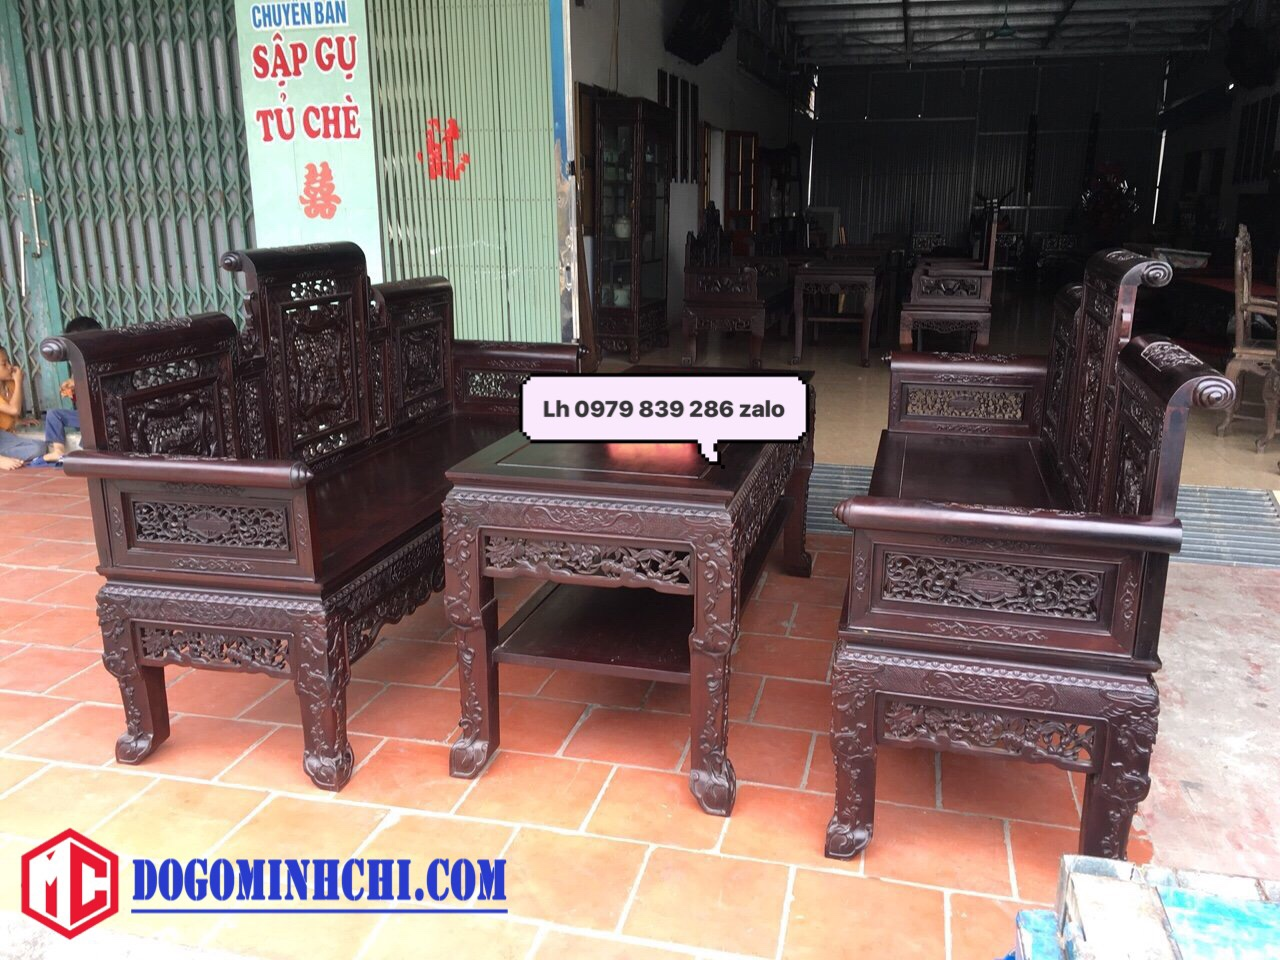 Bo-Truong-Ky-Tam-Son-Cham-Tich-Vai-Cuon-1